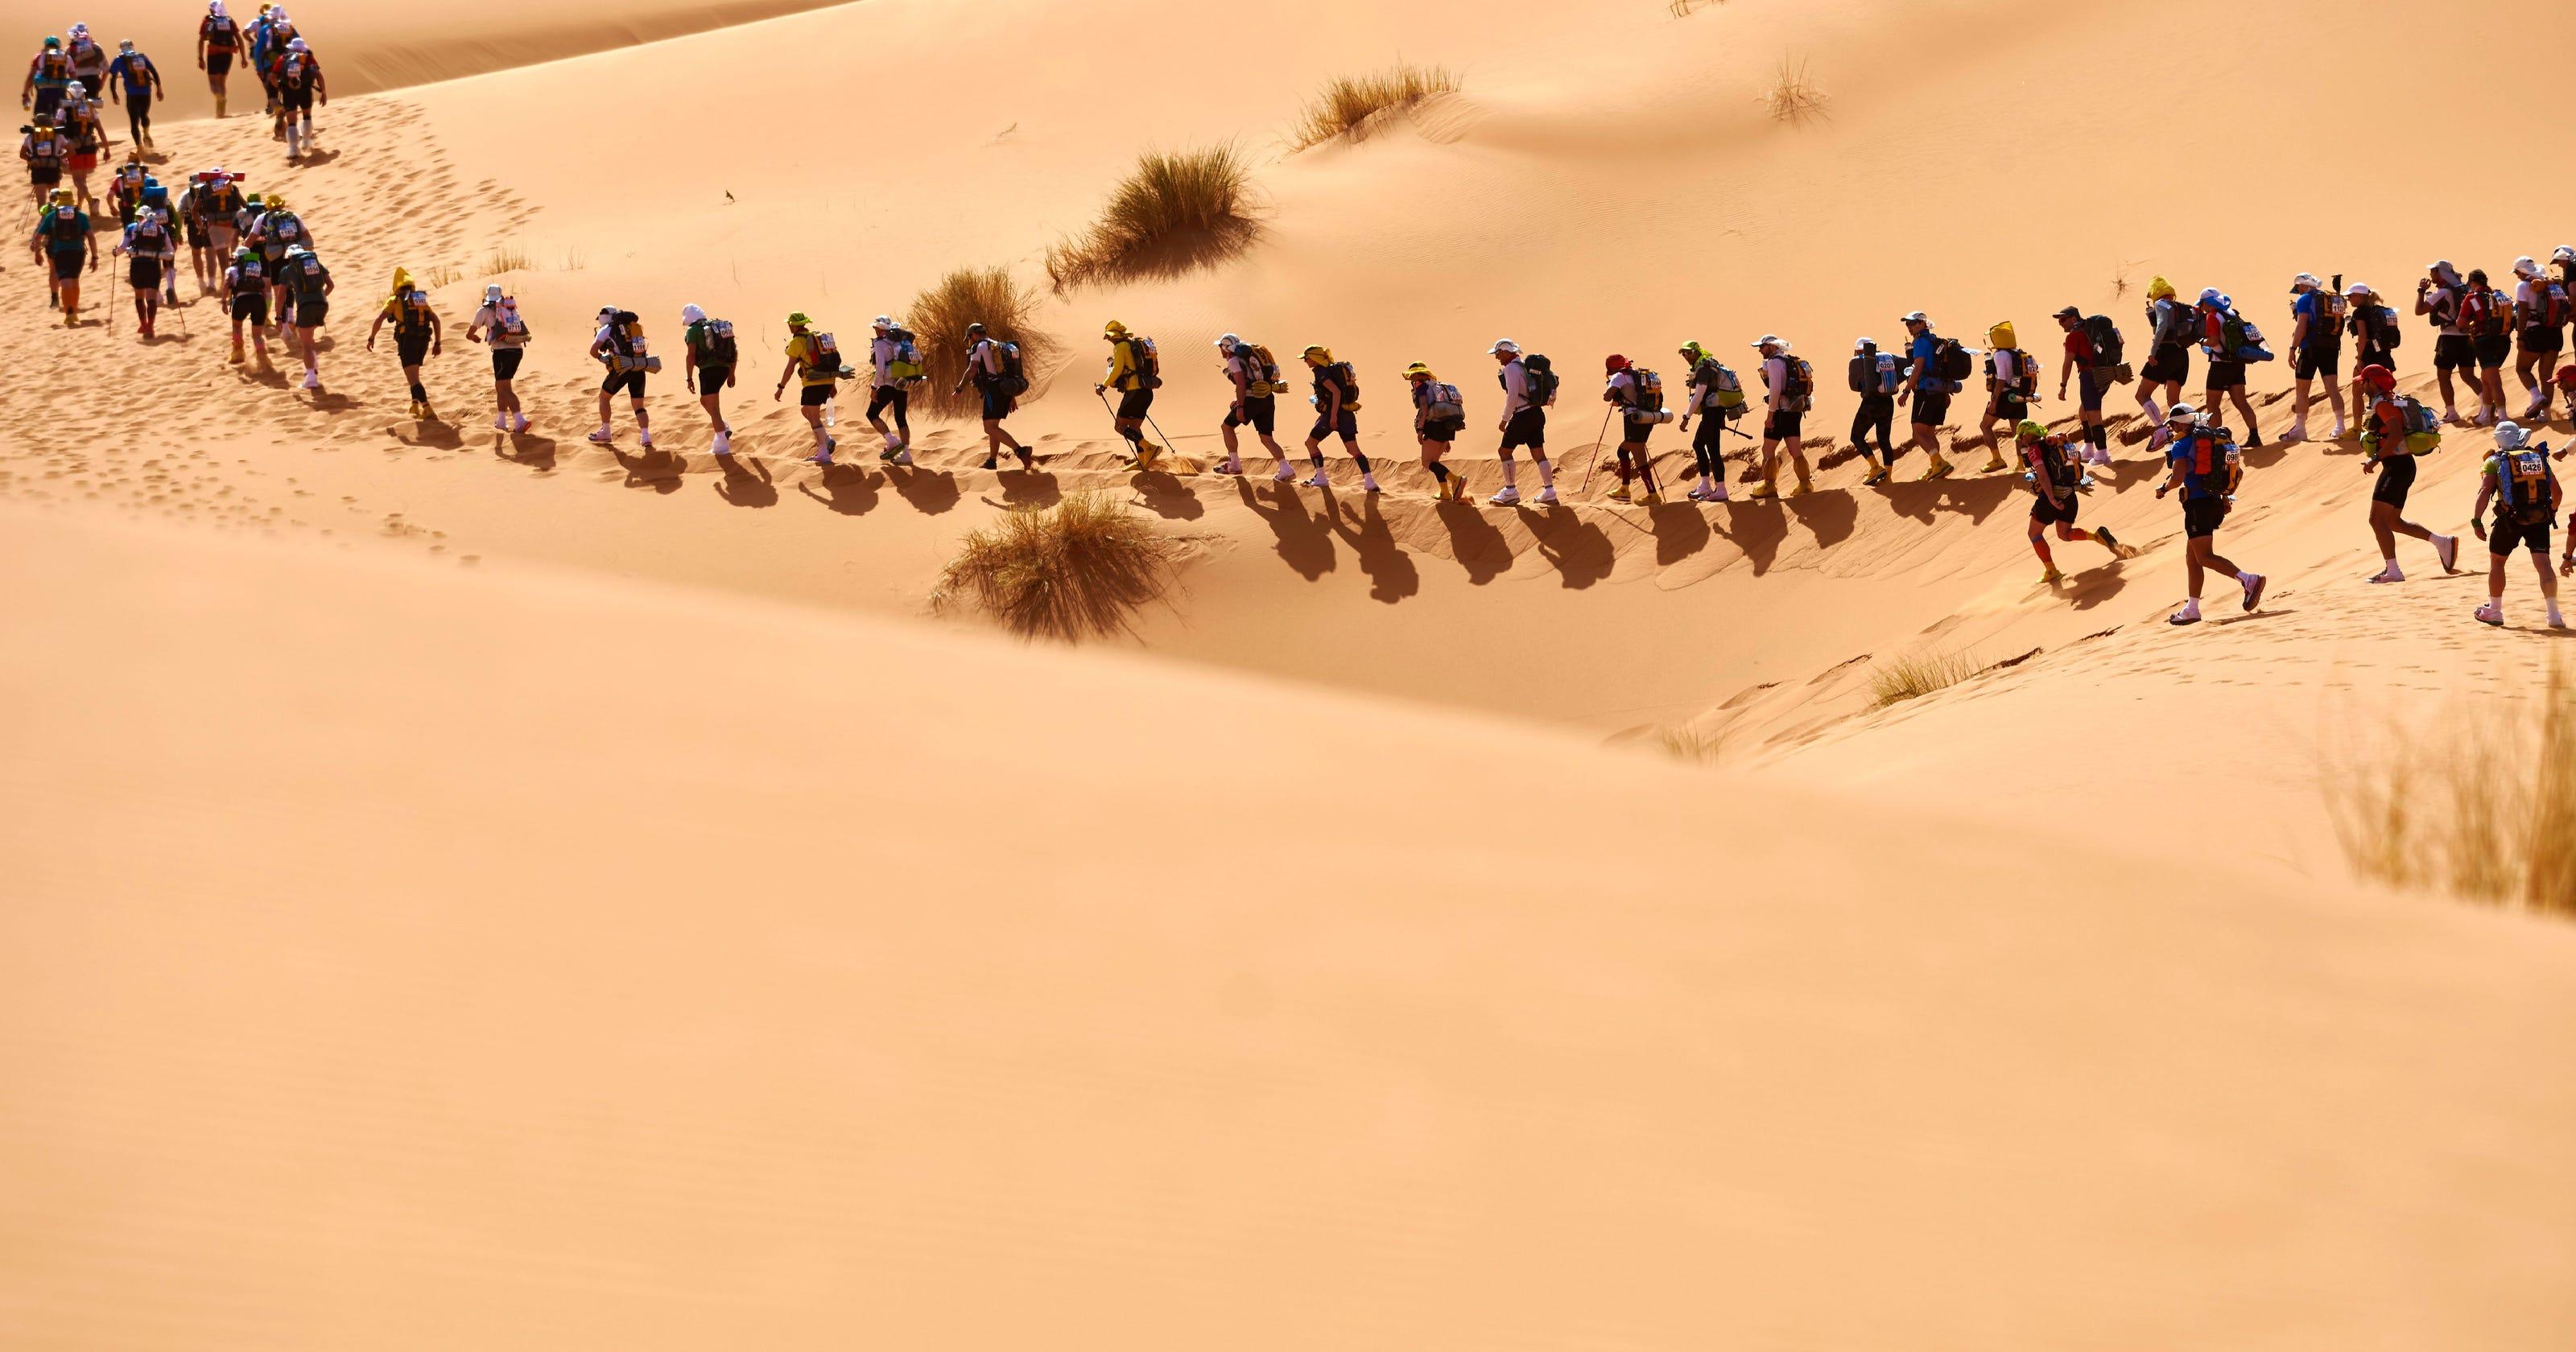 10 of the world's toughest ultramarathons